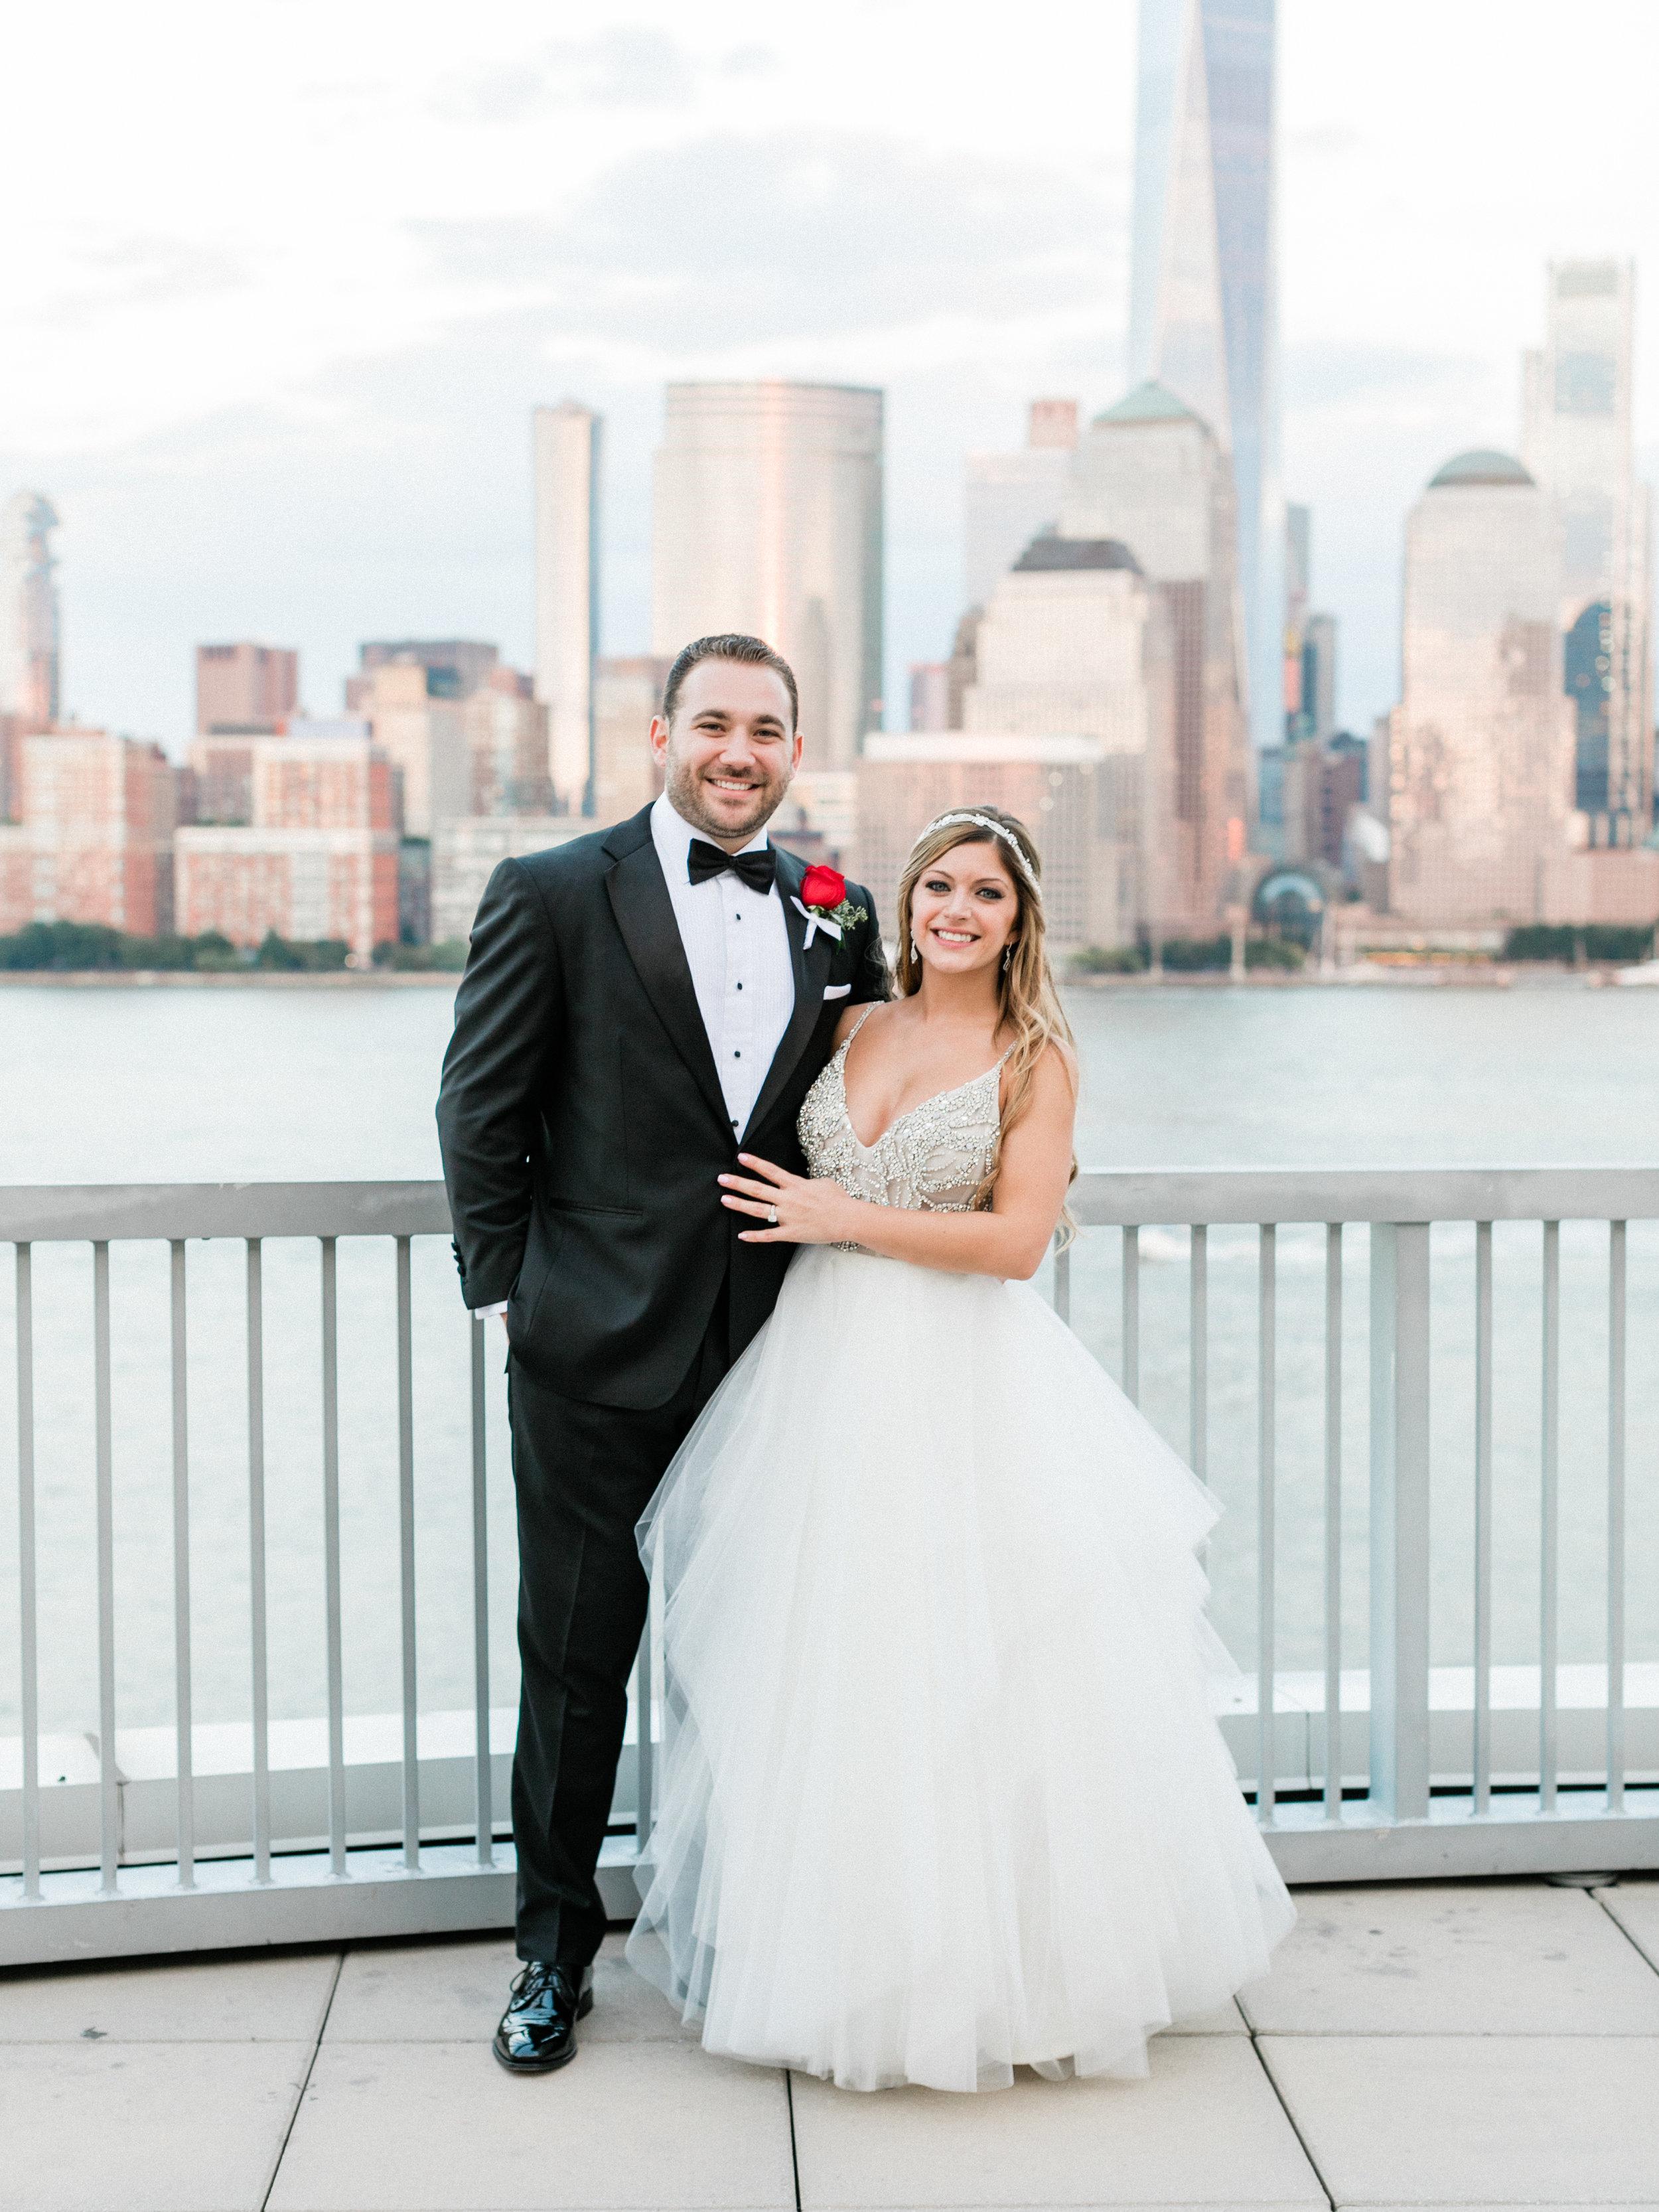 hyatt-regency-jersey-city-wedding-photographer55.jpg